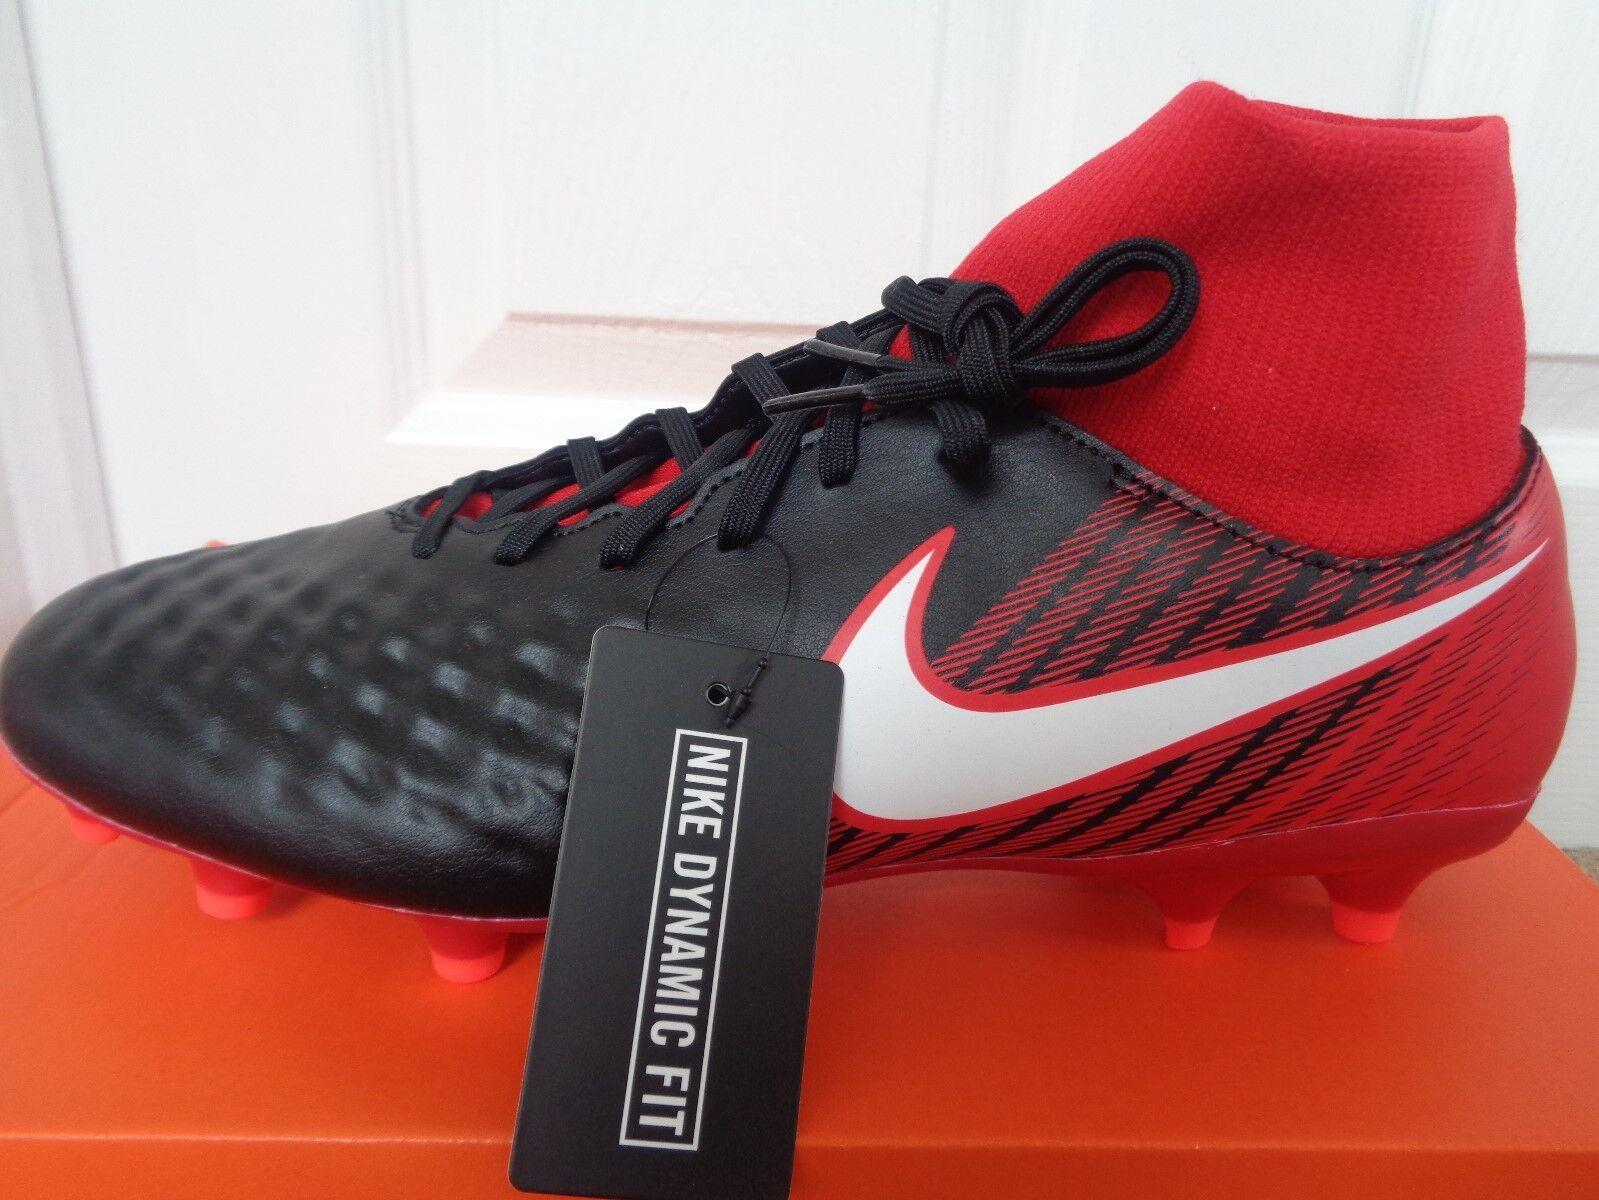 Nike magista onda II DF FG botas de fútbol fútbol fútbol 917787 061 EU 45 US 11 nuevo   caja baratos zapatos de mujer zapatos de mujer ca5e47